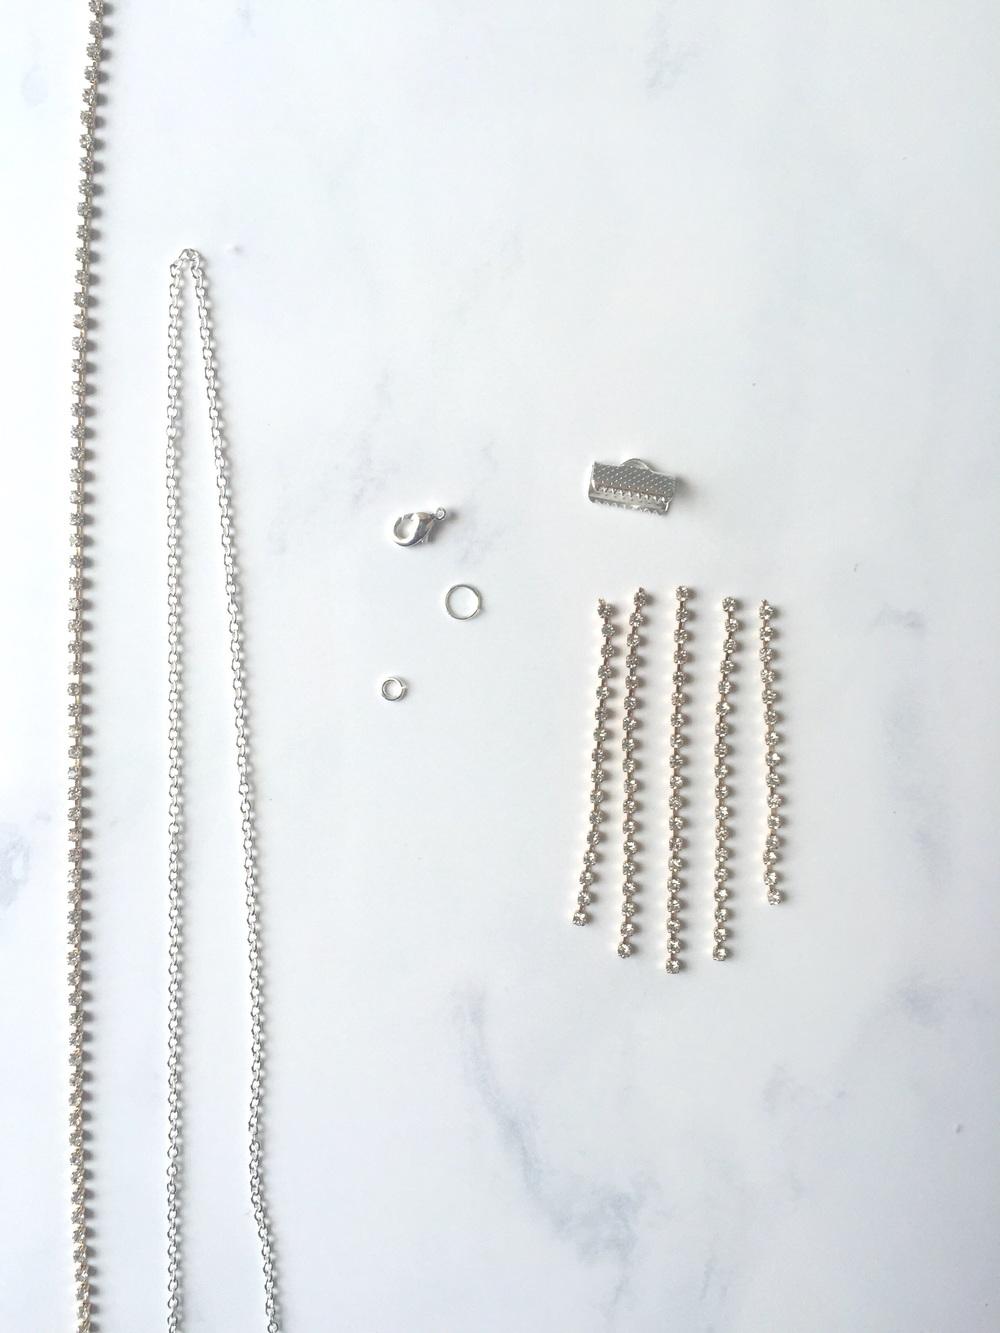 Materials: silver chain, rhinestone chain, silver jump rings and clasp, silver clamp bail.